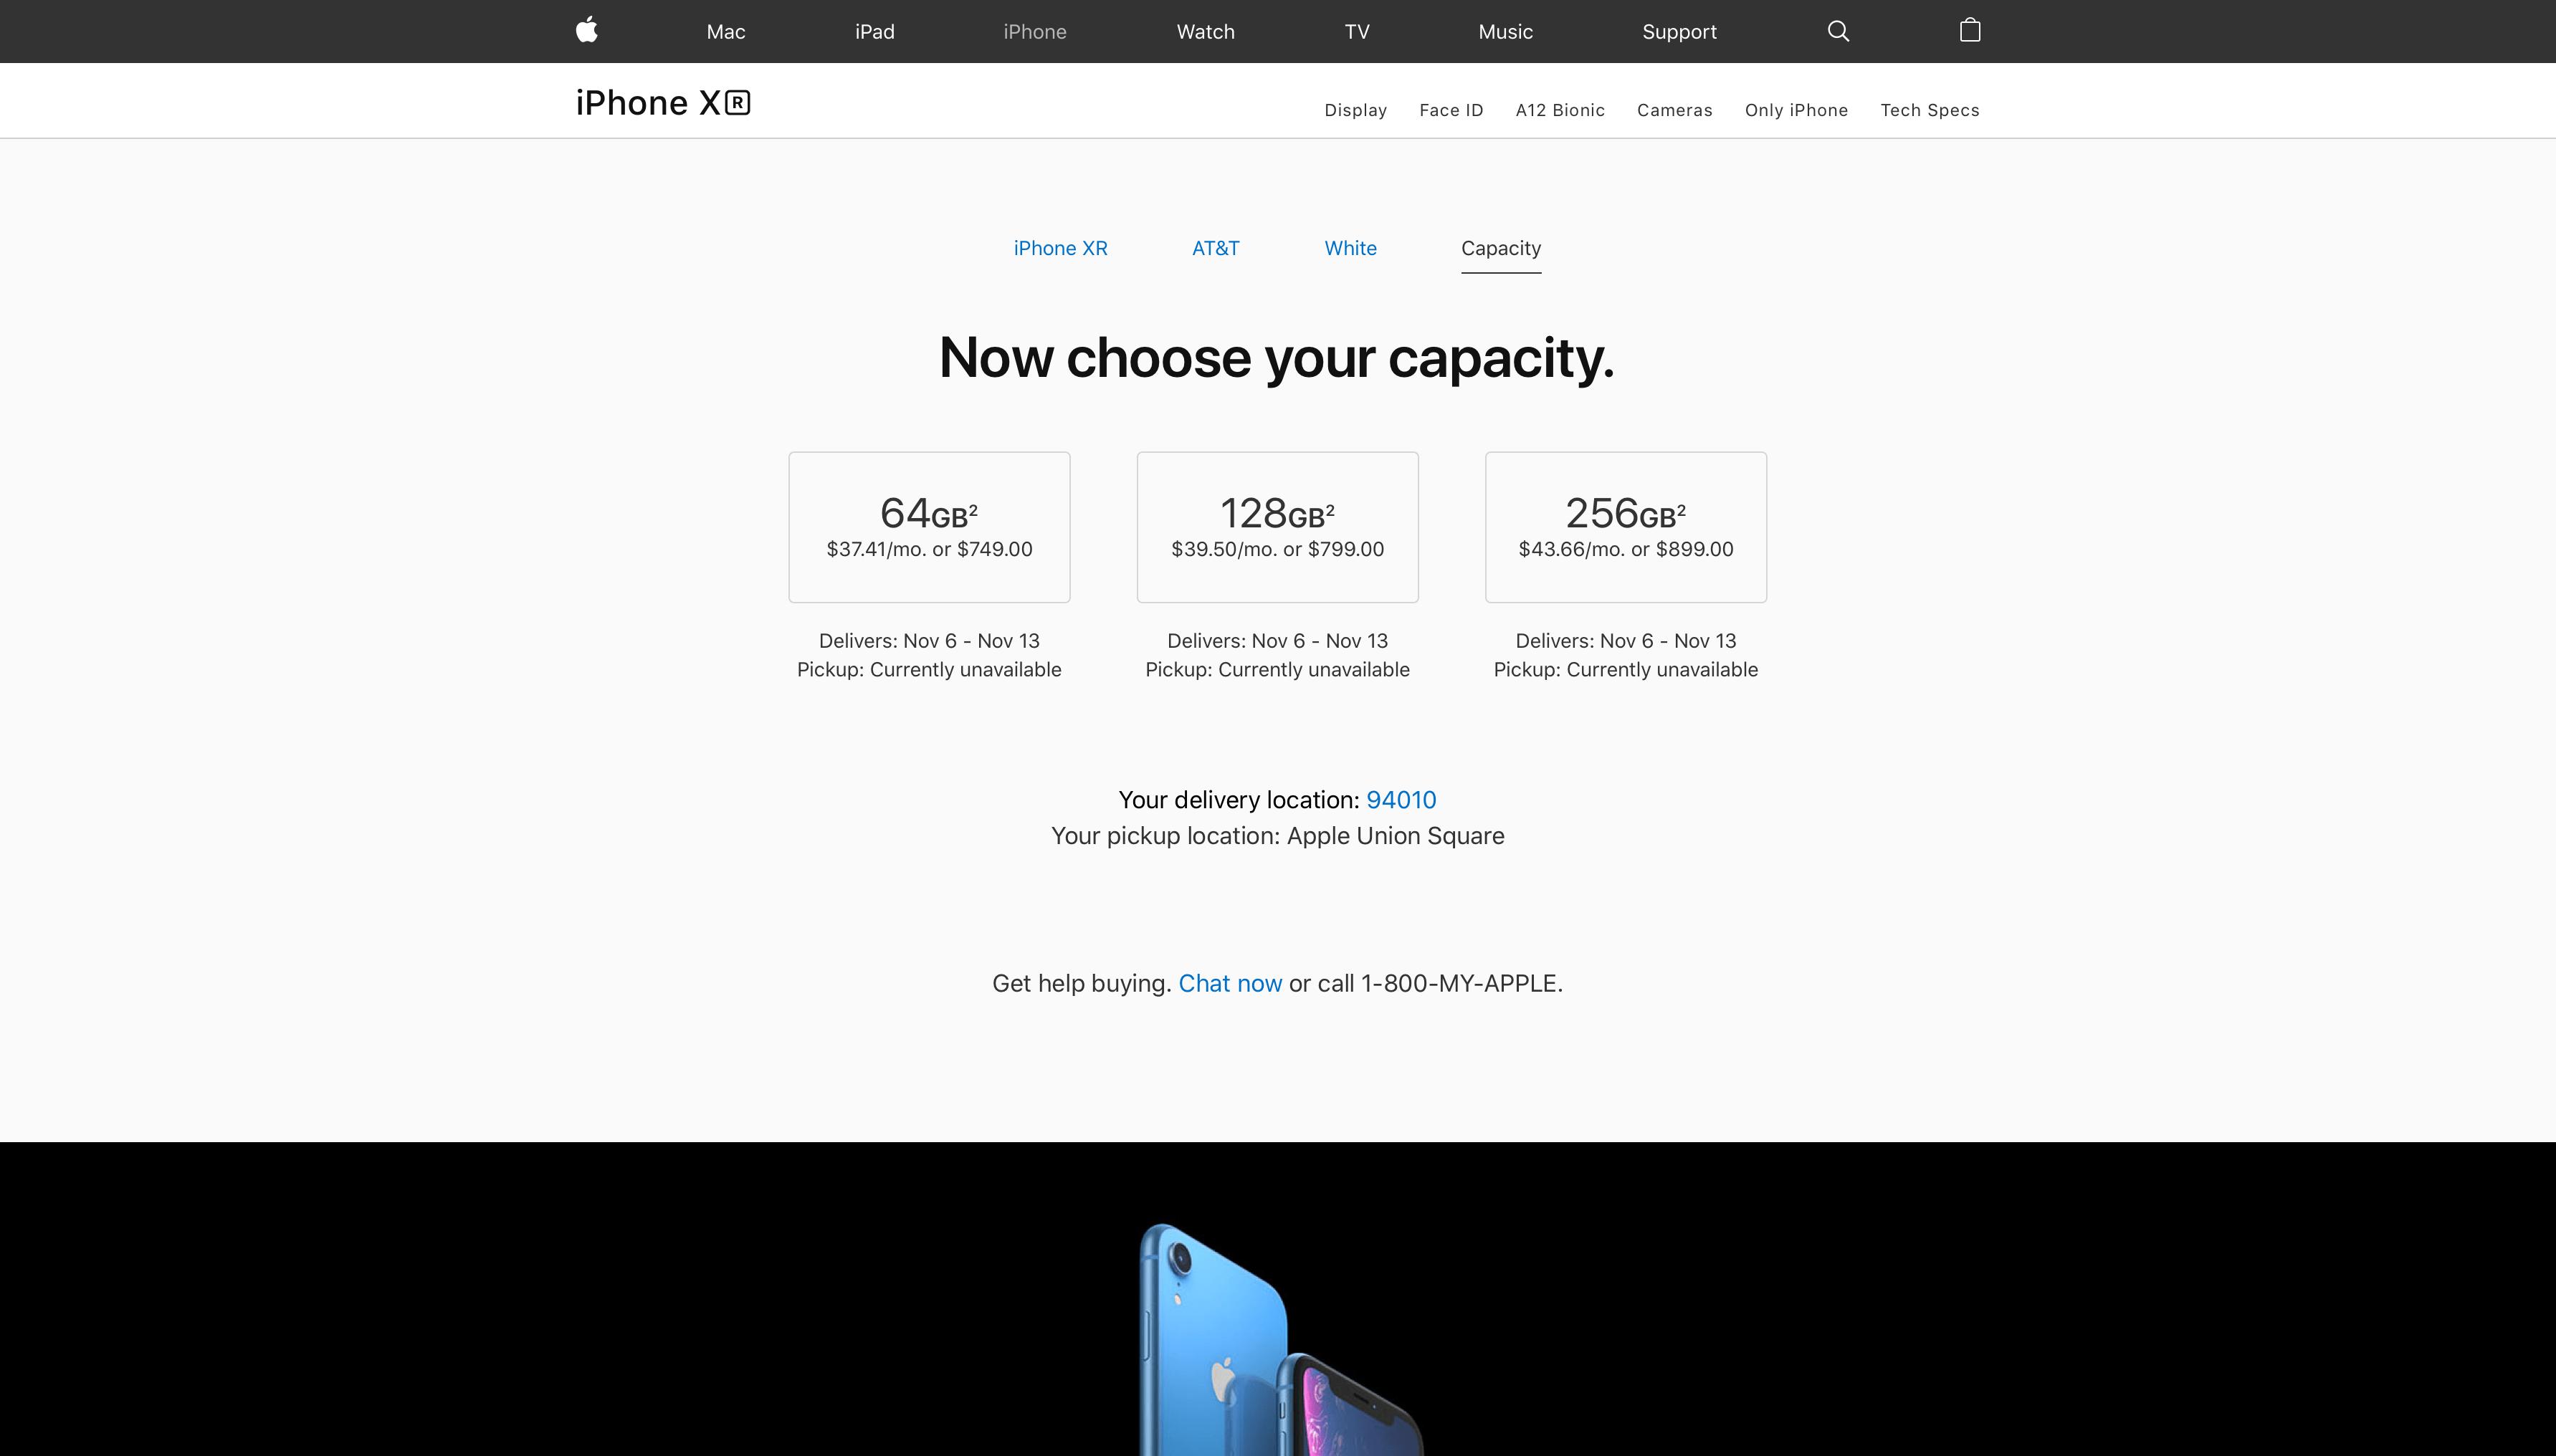 Tempo de entrega do iPhone XR branco na Apple Online Store americana